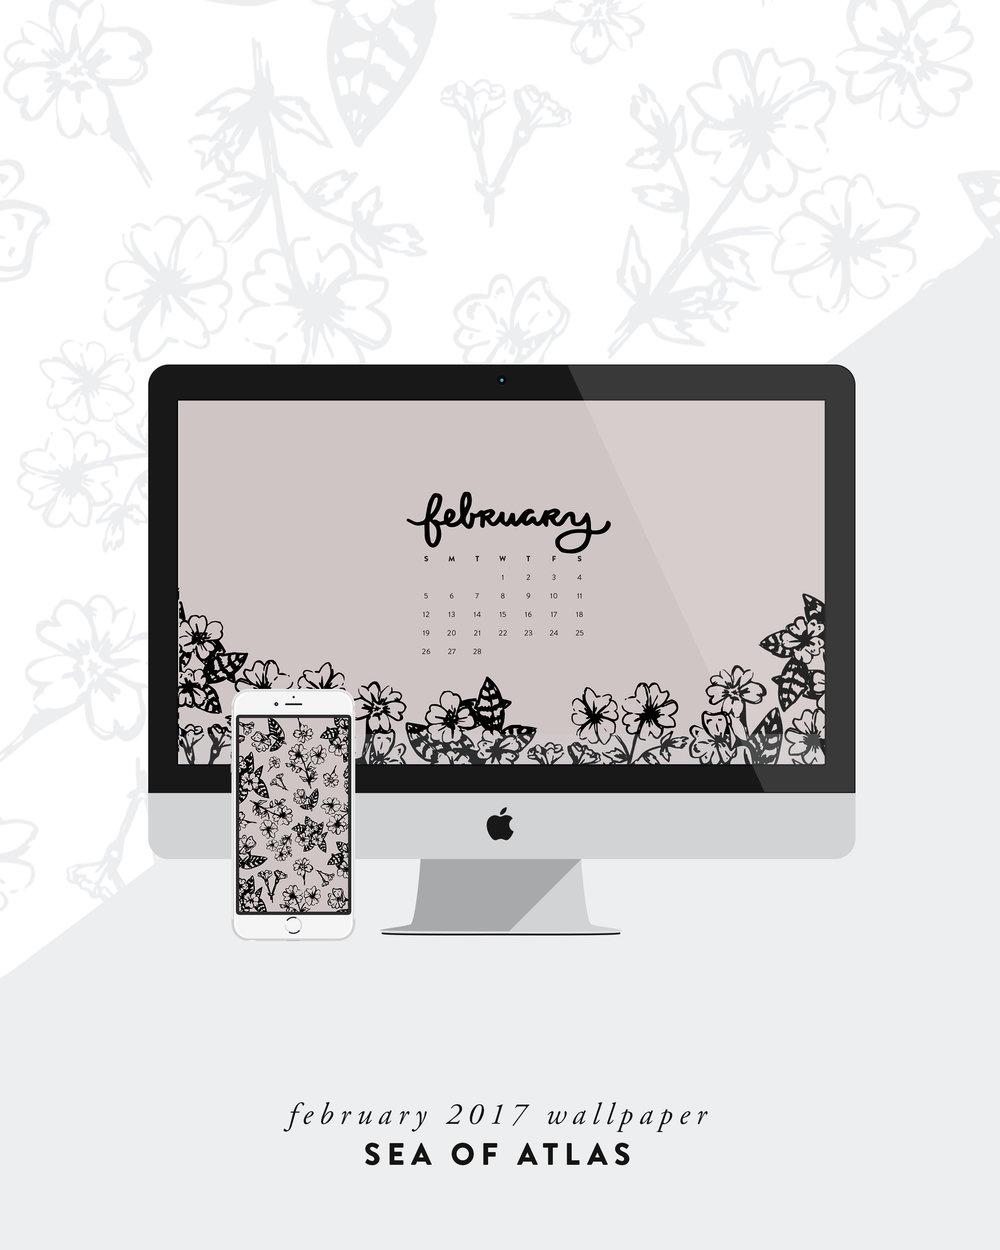 Desktop Wallpaper: February 2017 Calendar | Sea of Atlas